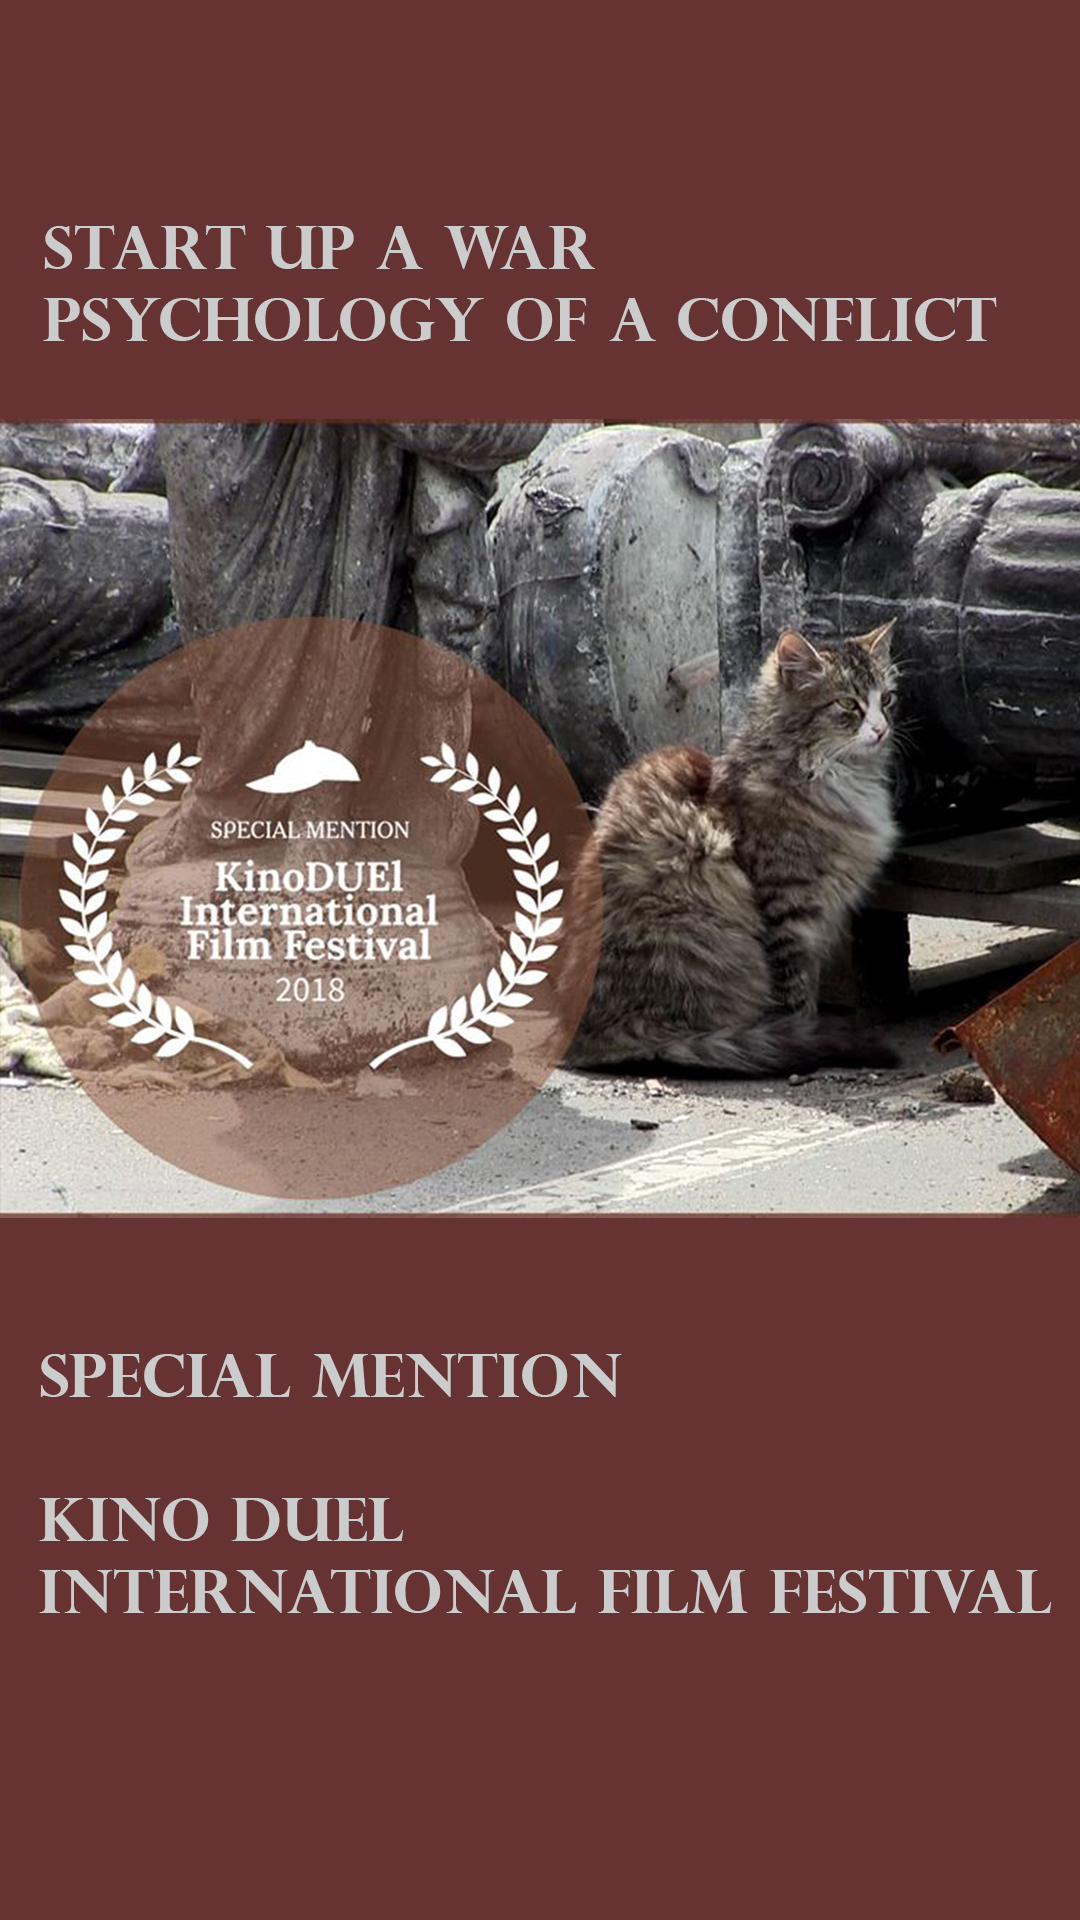 Sara Reginella | Kino Duel International Film Festival